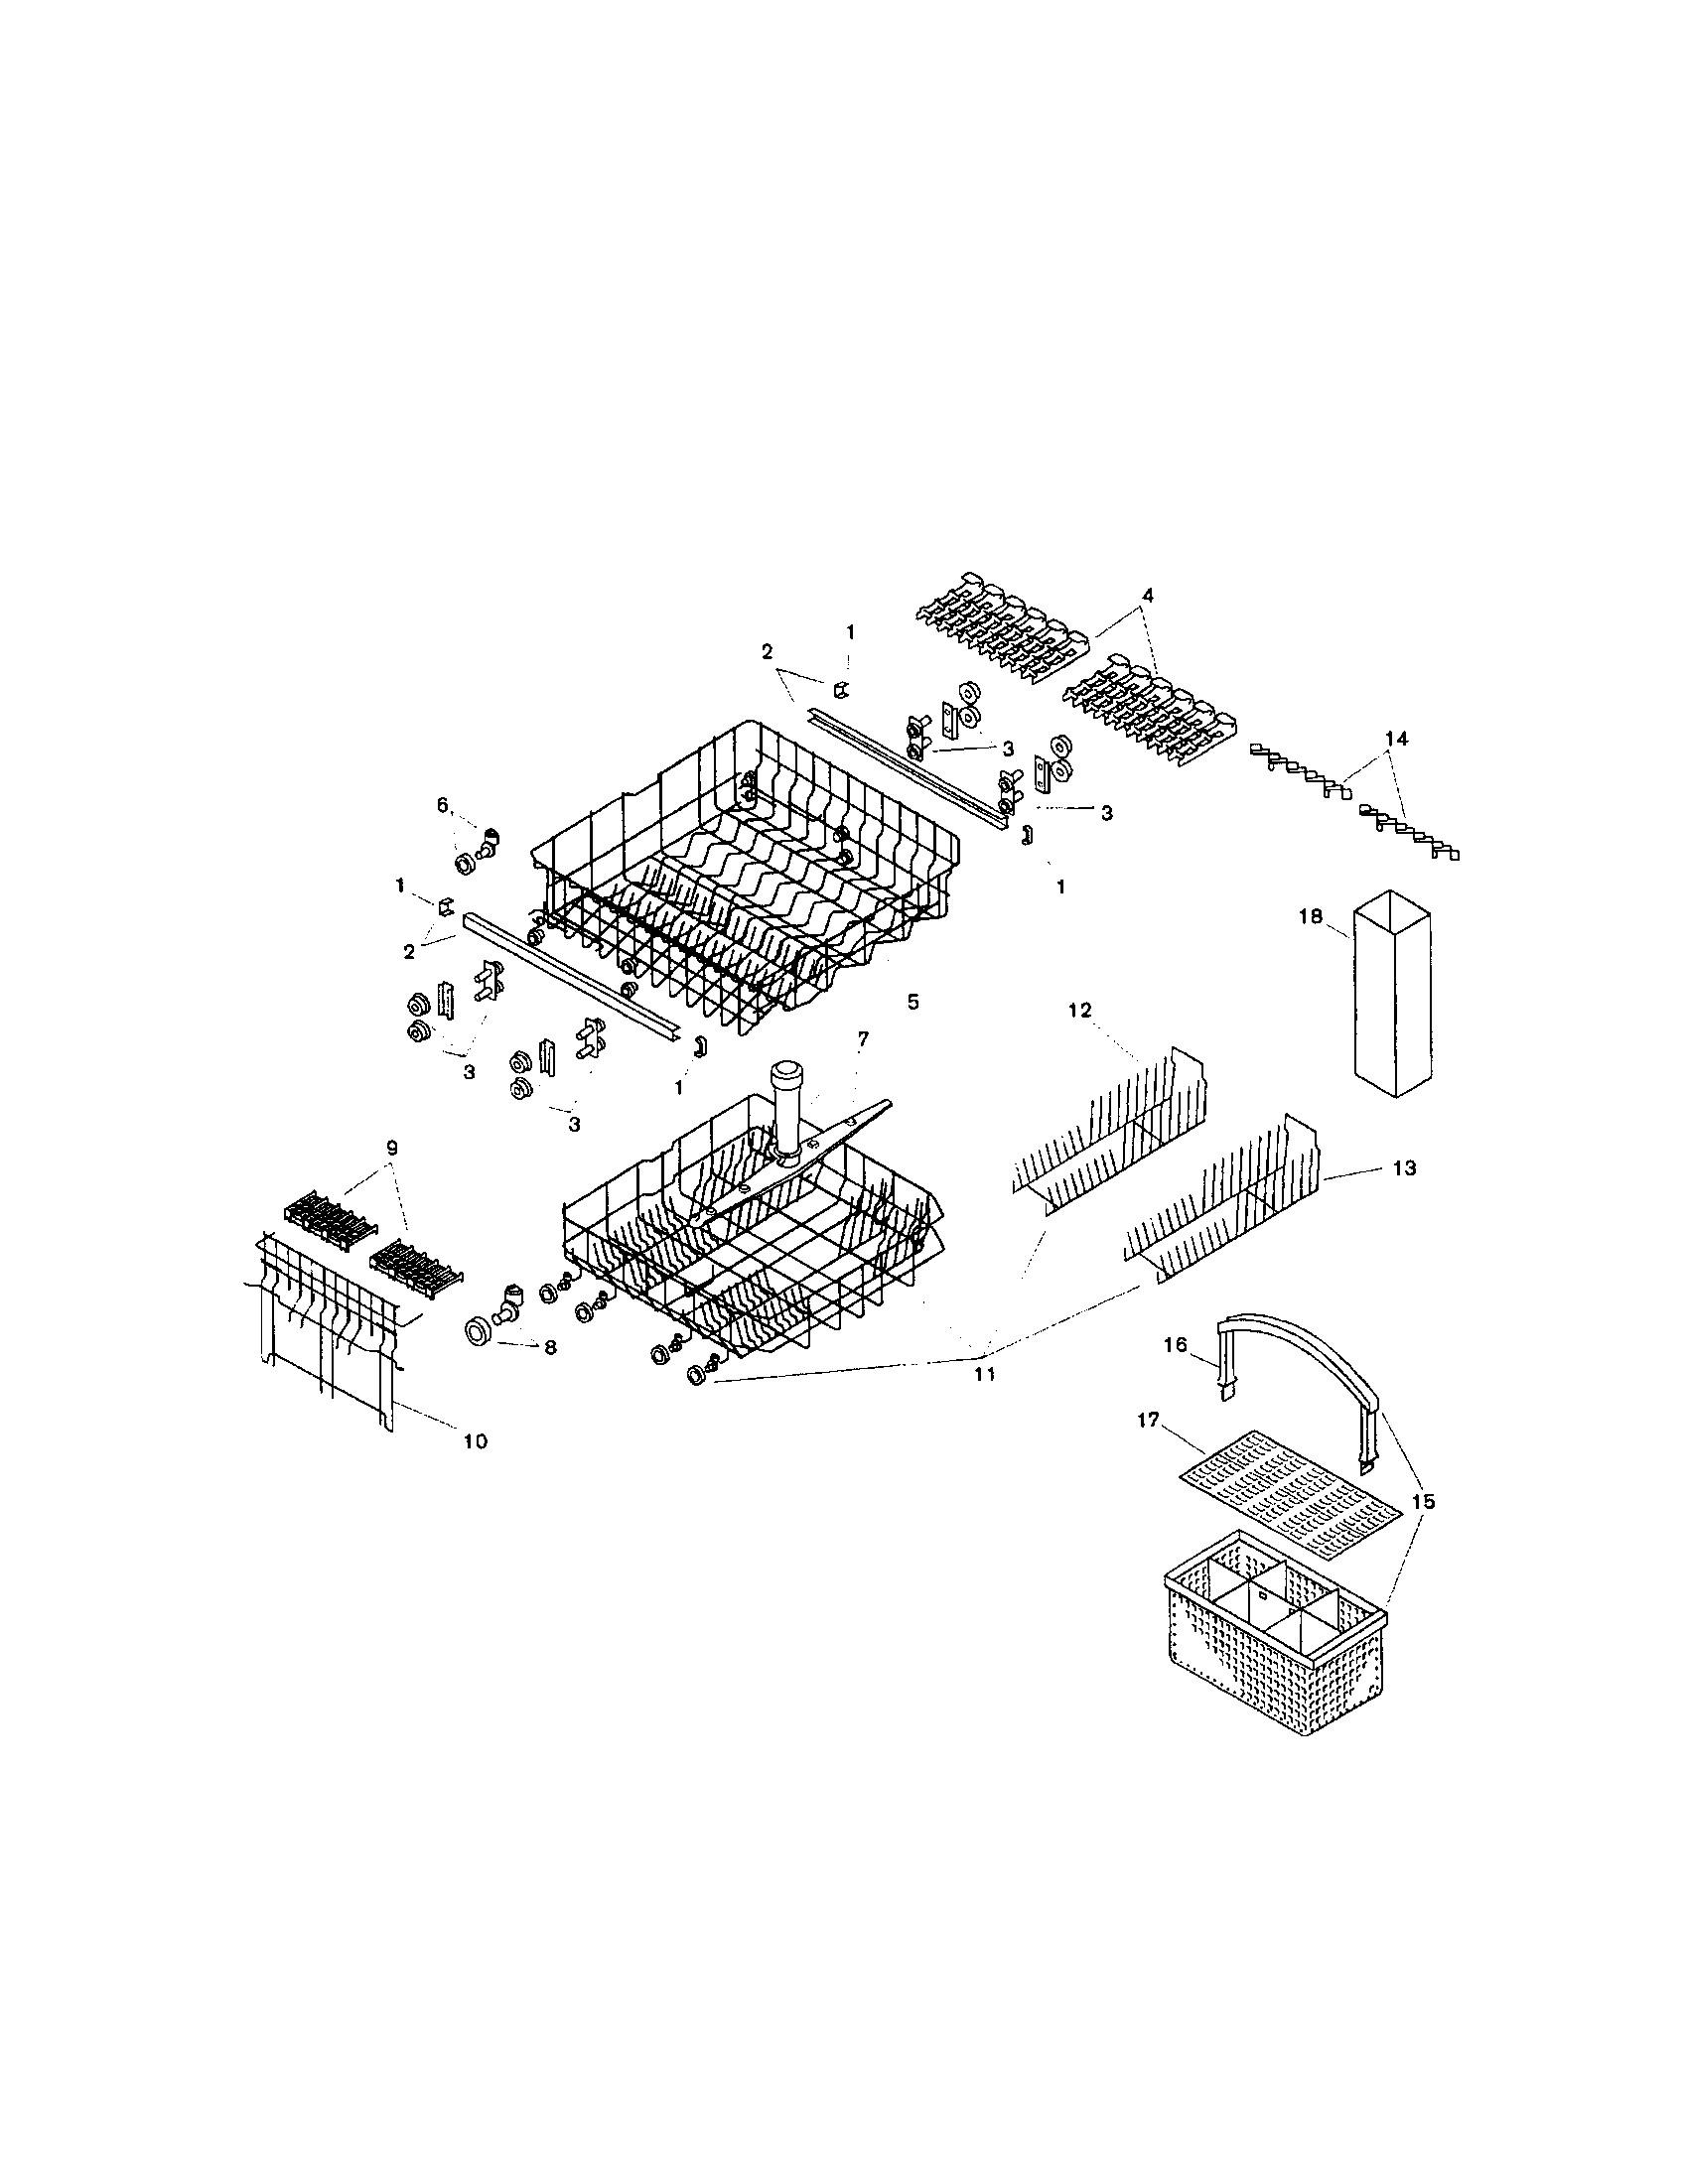 Asko Dishwasher Parts Diagram